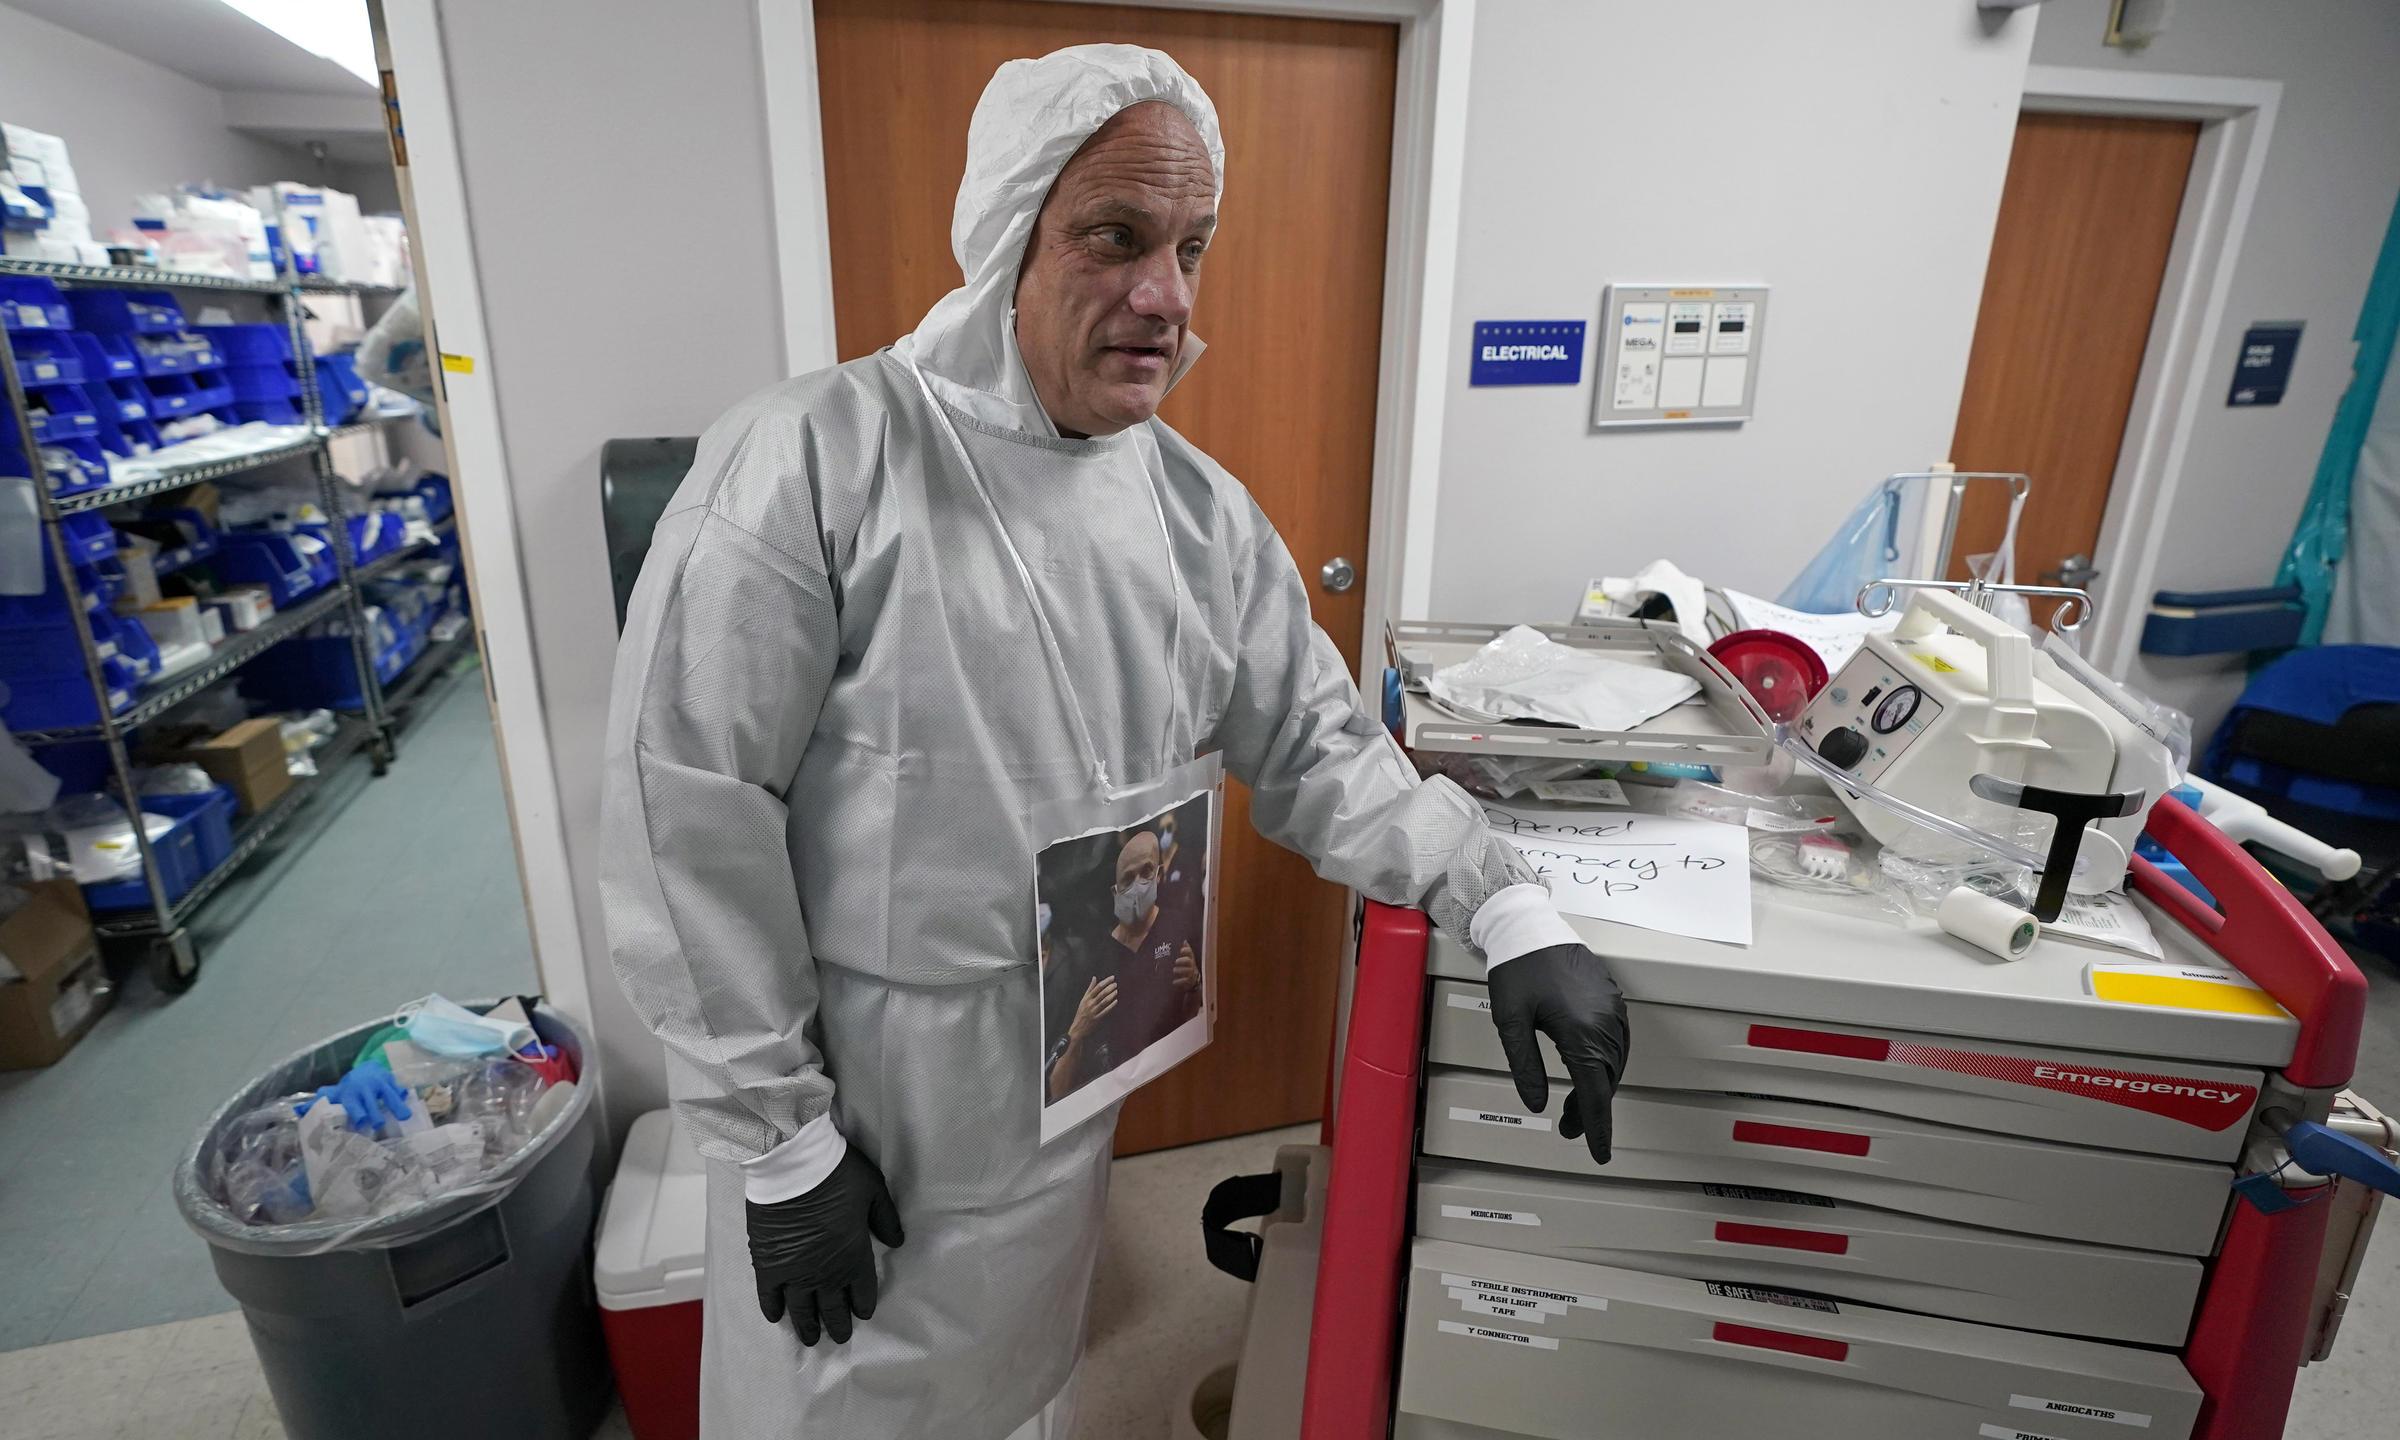 A Houston Doctor On His Hospital's 'Deadliest Week' So Far | KPCW